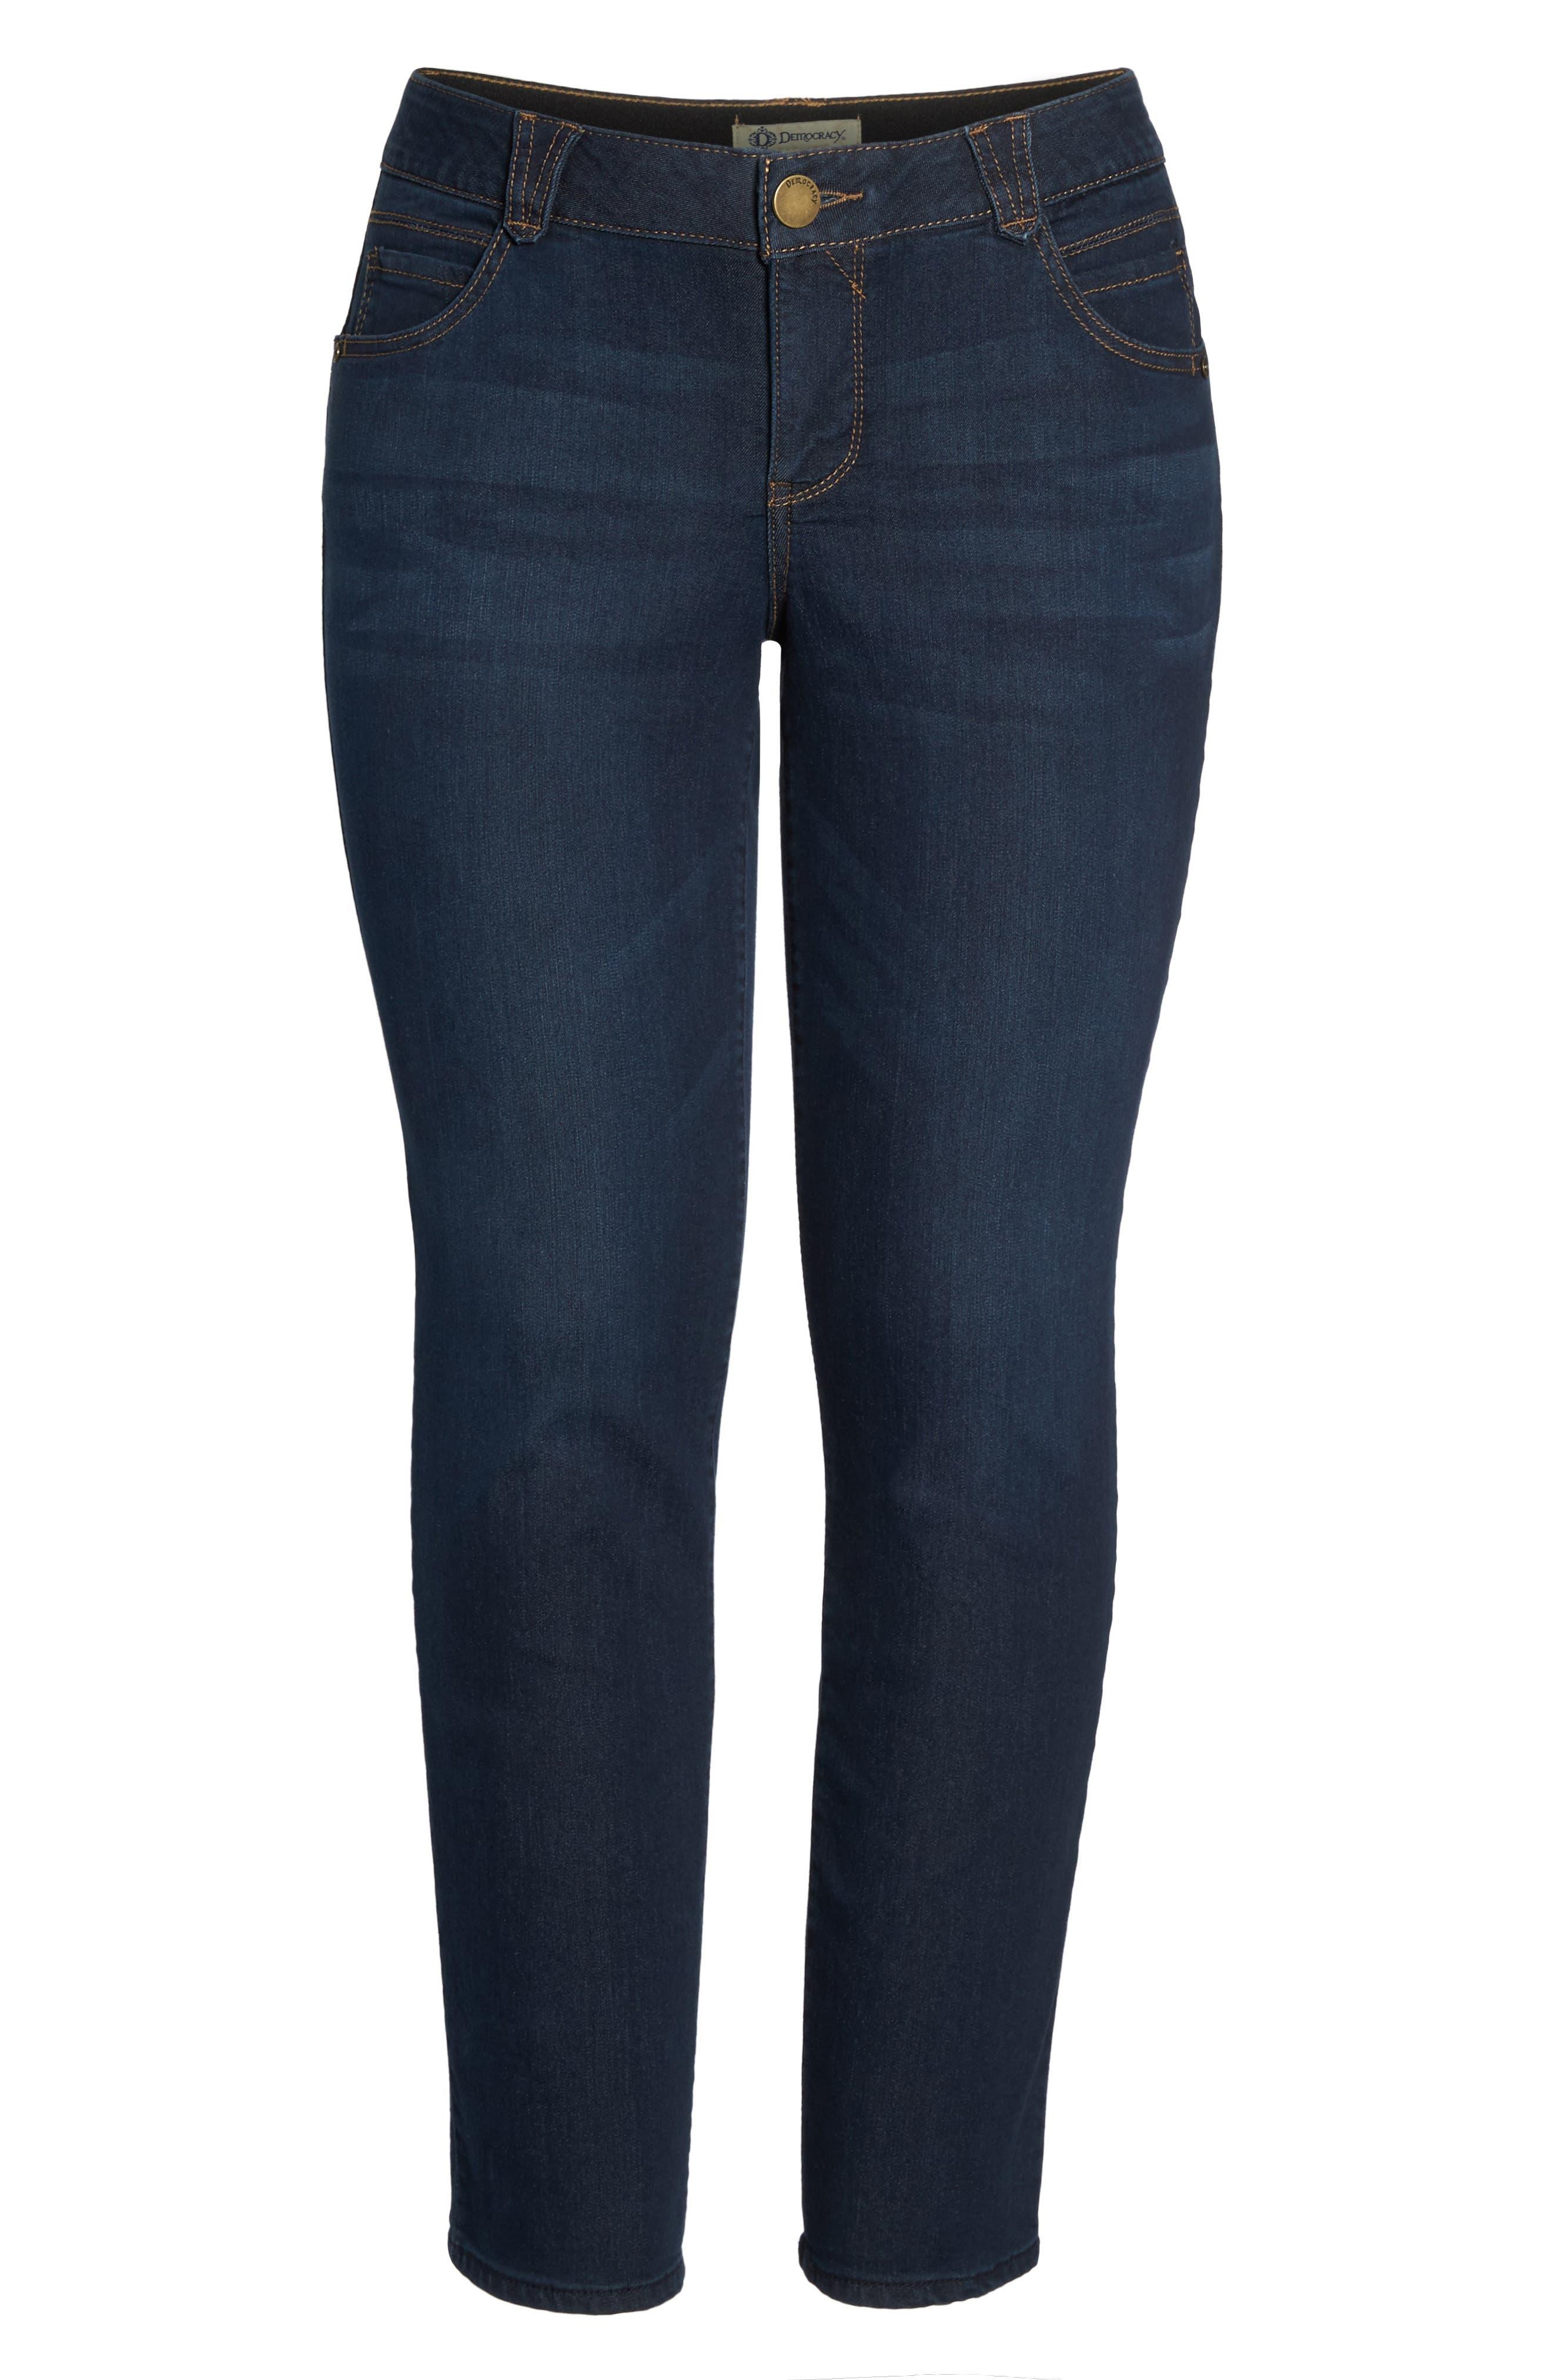 Ab-Solution Stretch Straight Leg Jeans,                             Alternate thumbnail 6, color,                             Indigo